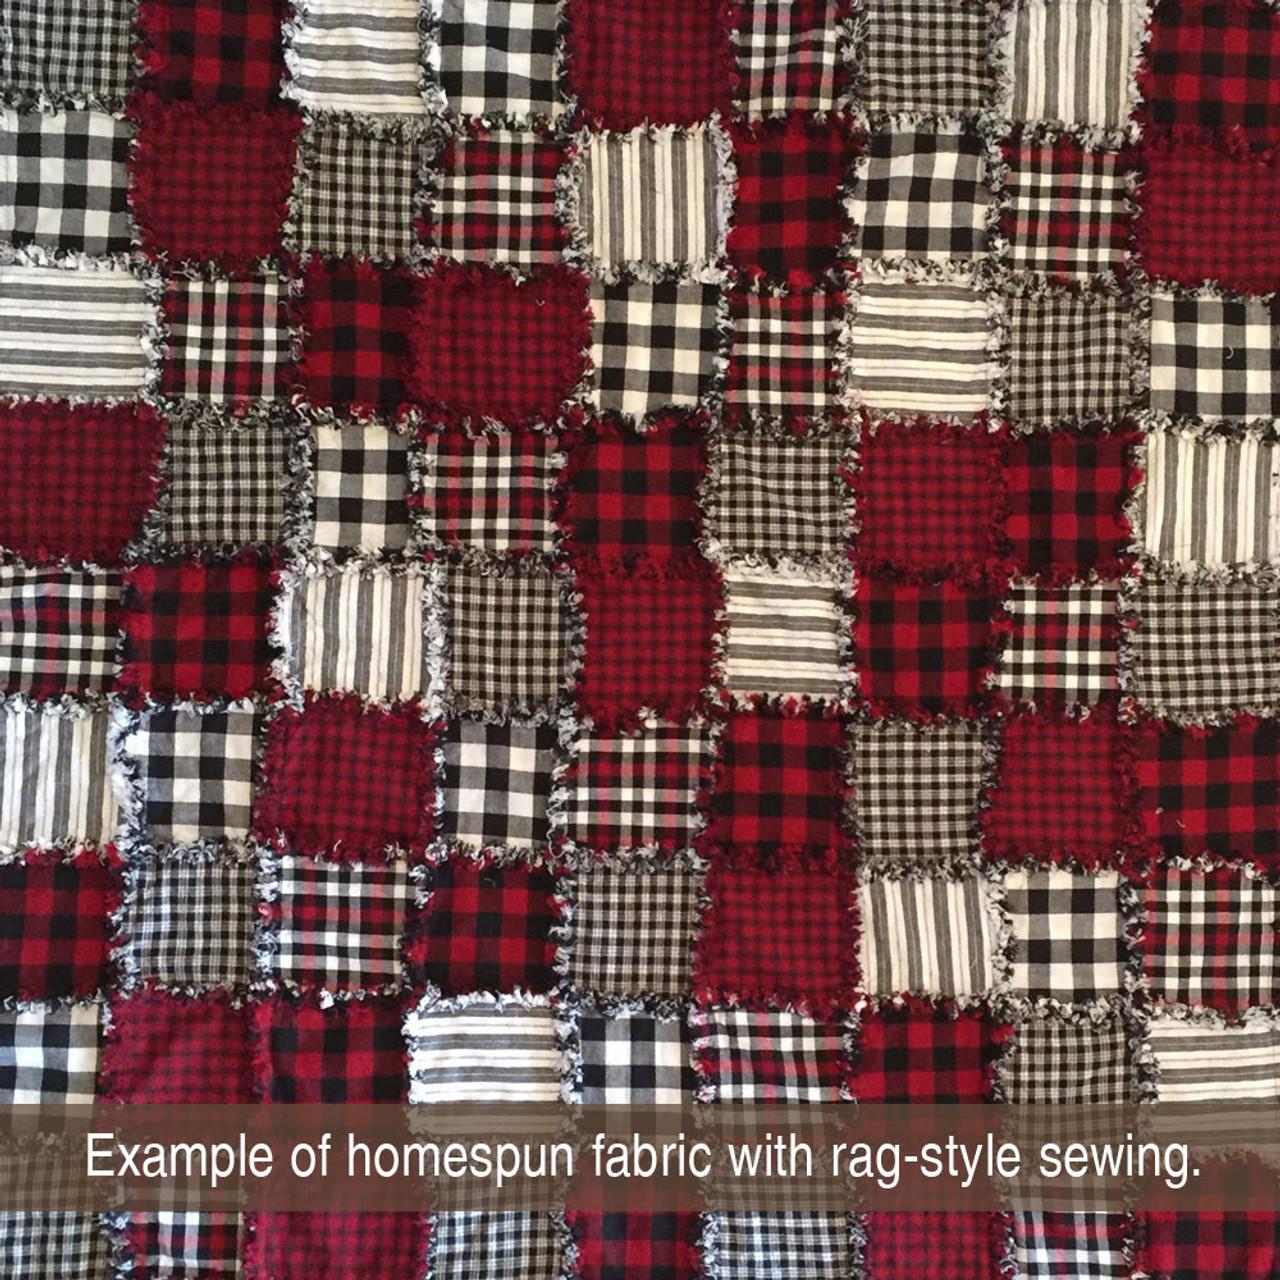 Mountain Lodge 2 White Plaid Homespun Cotton Fabric